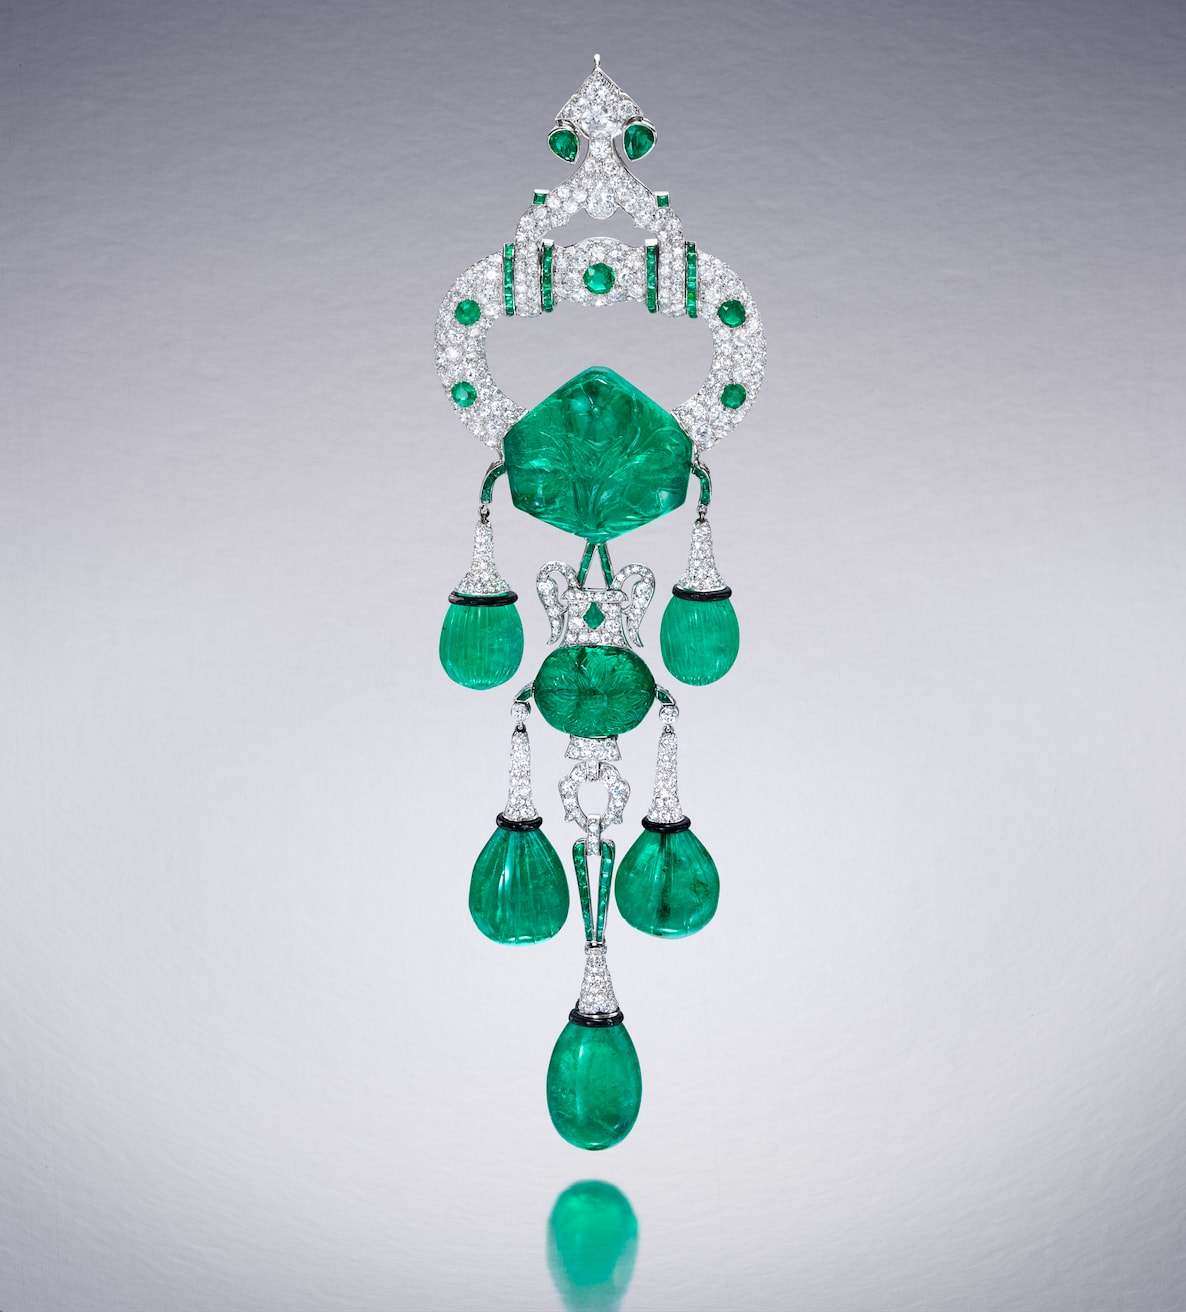 Cartier-emerald-diamond-brooch-1928